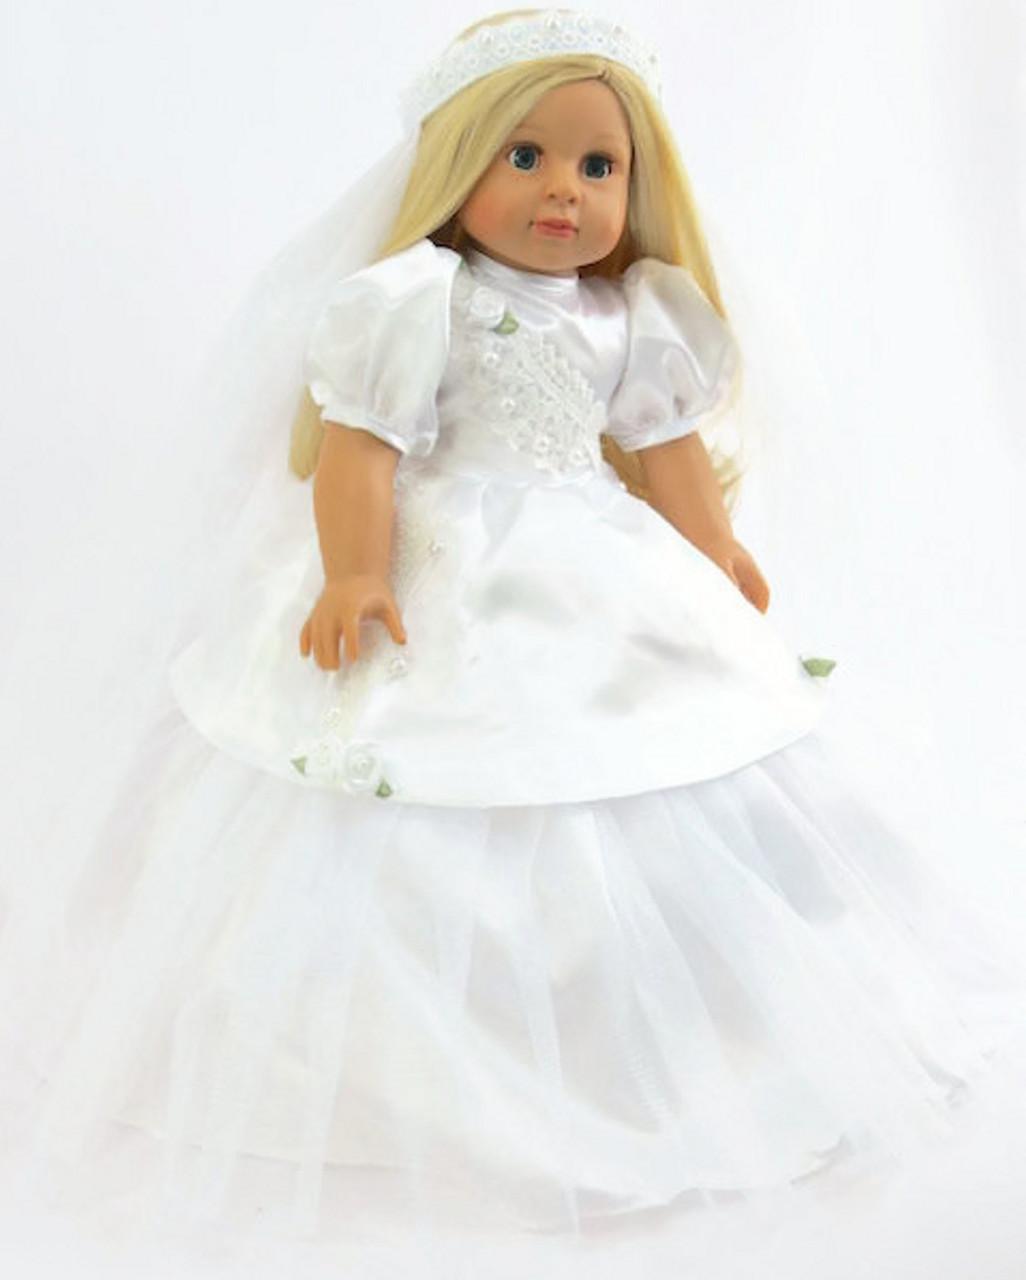 Wedding Communion Gown /& Hair Wreath Veil for 18 inch American Girl Doll Clothes